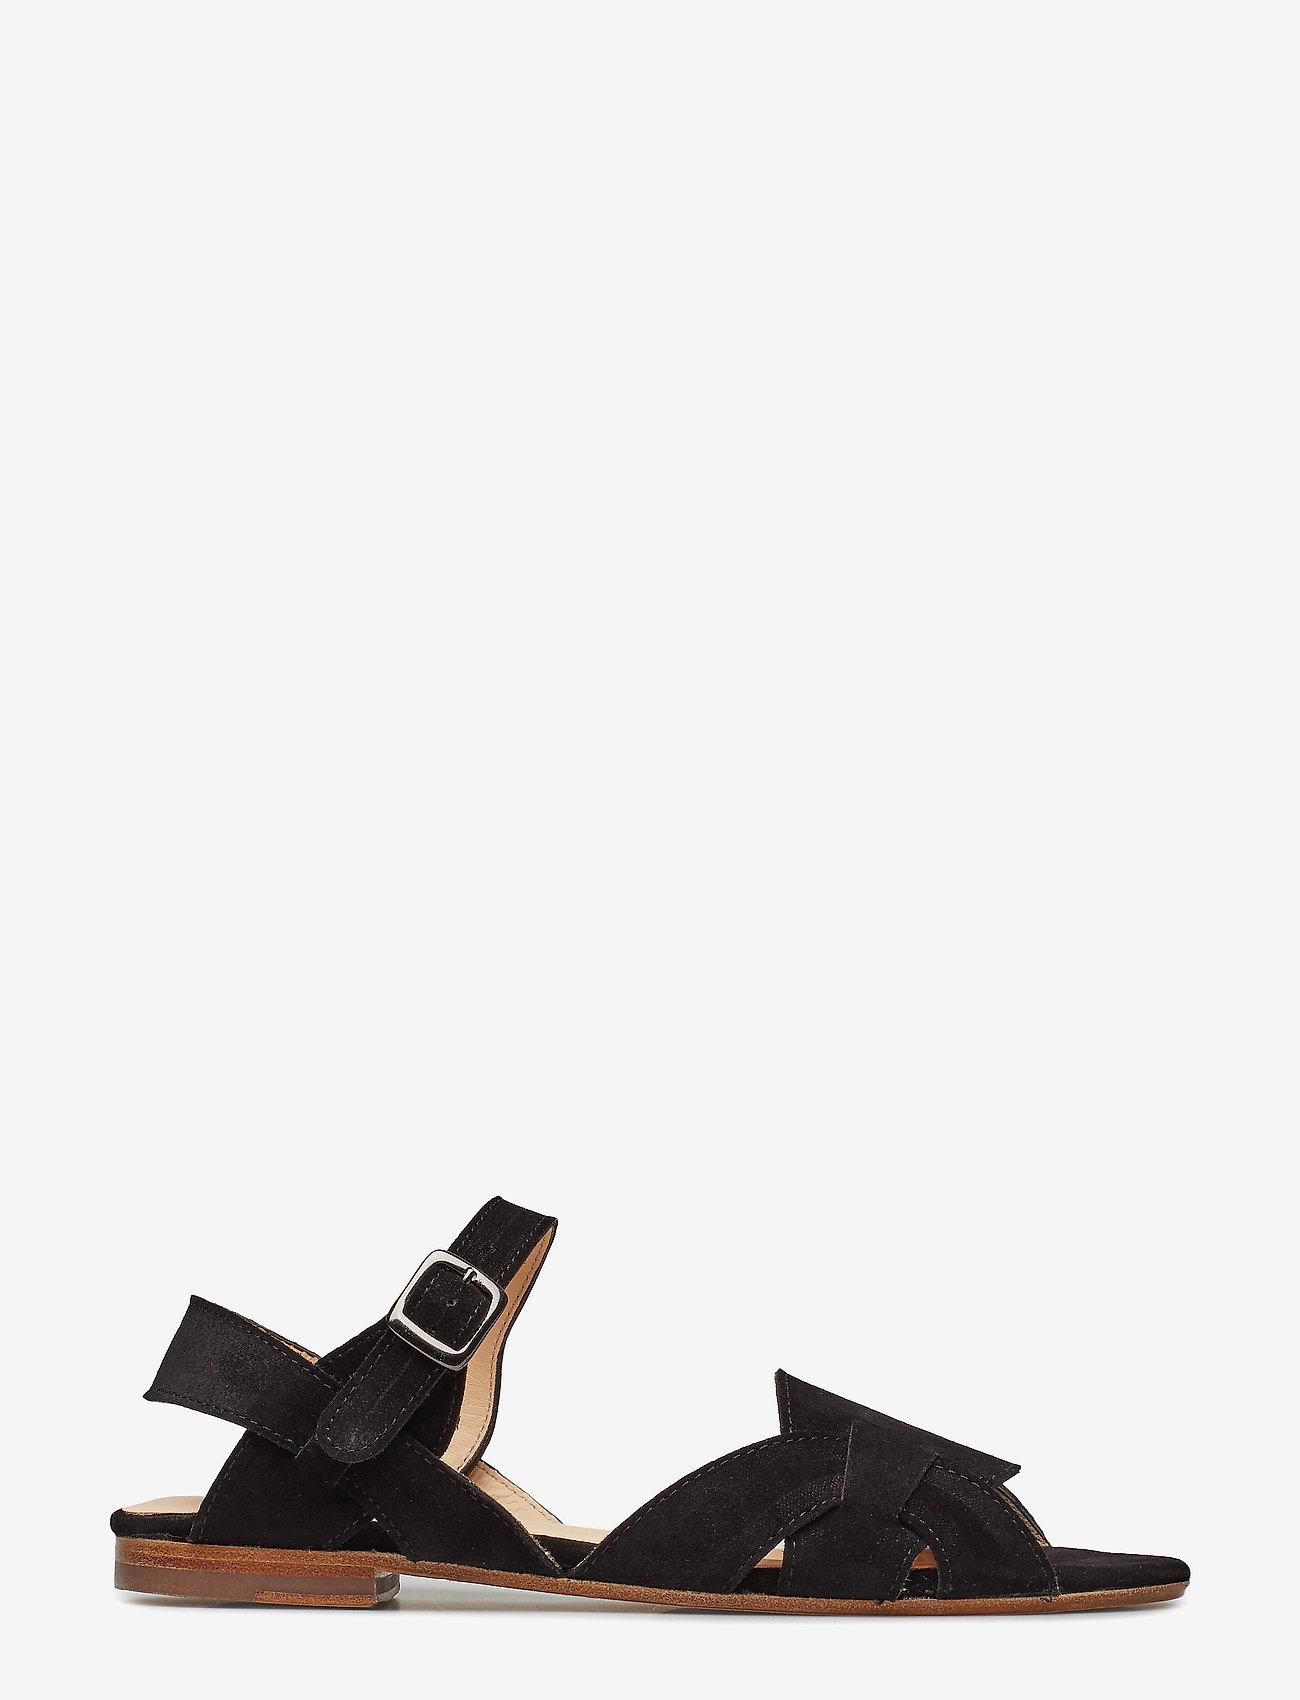 ANGULUS - Sandals - flat - platta sandaler - 1163 black - 1